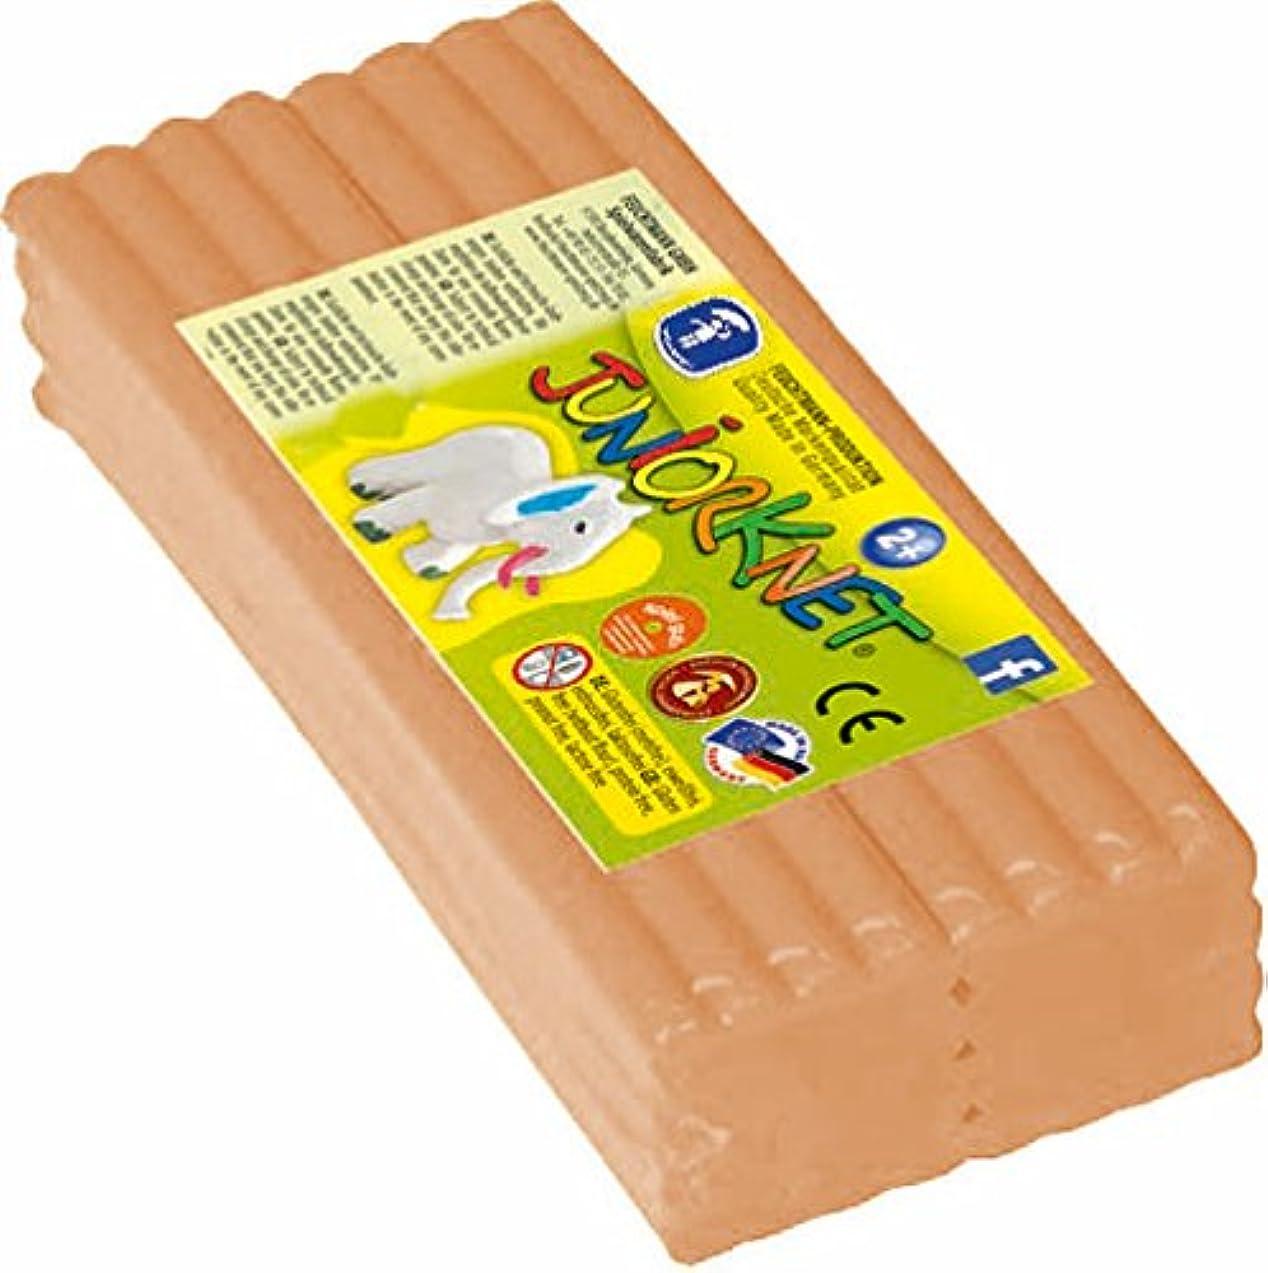 Feuchtmann 628 0305-11 Juniorknet Jumbo Pack -Clay Dough- 500 G - Skin Color, Multi Colour